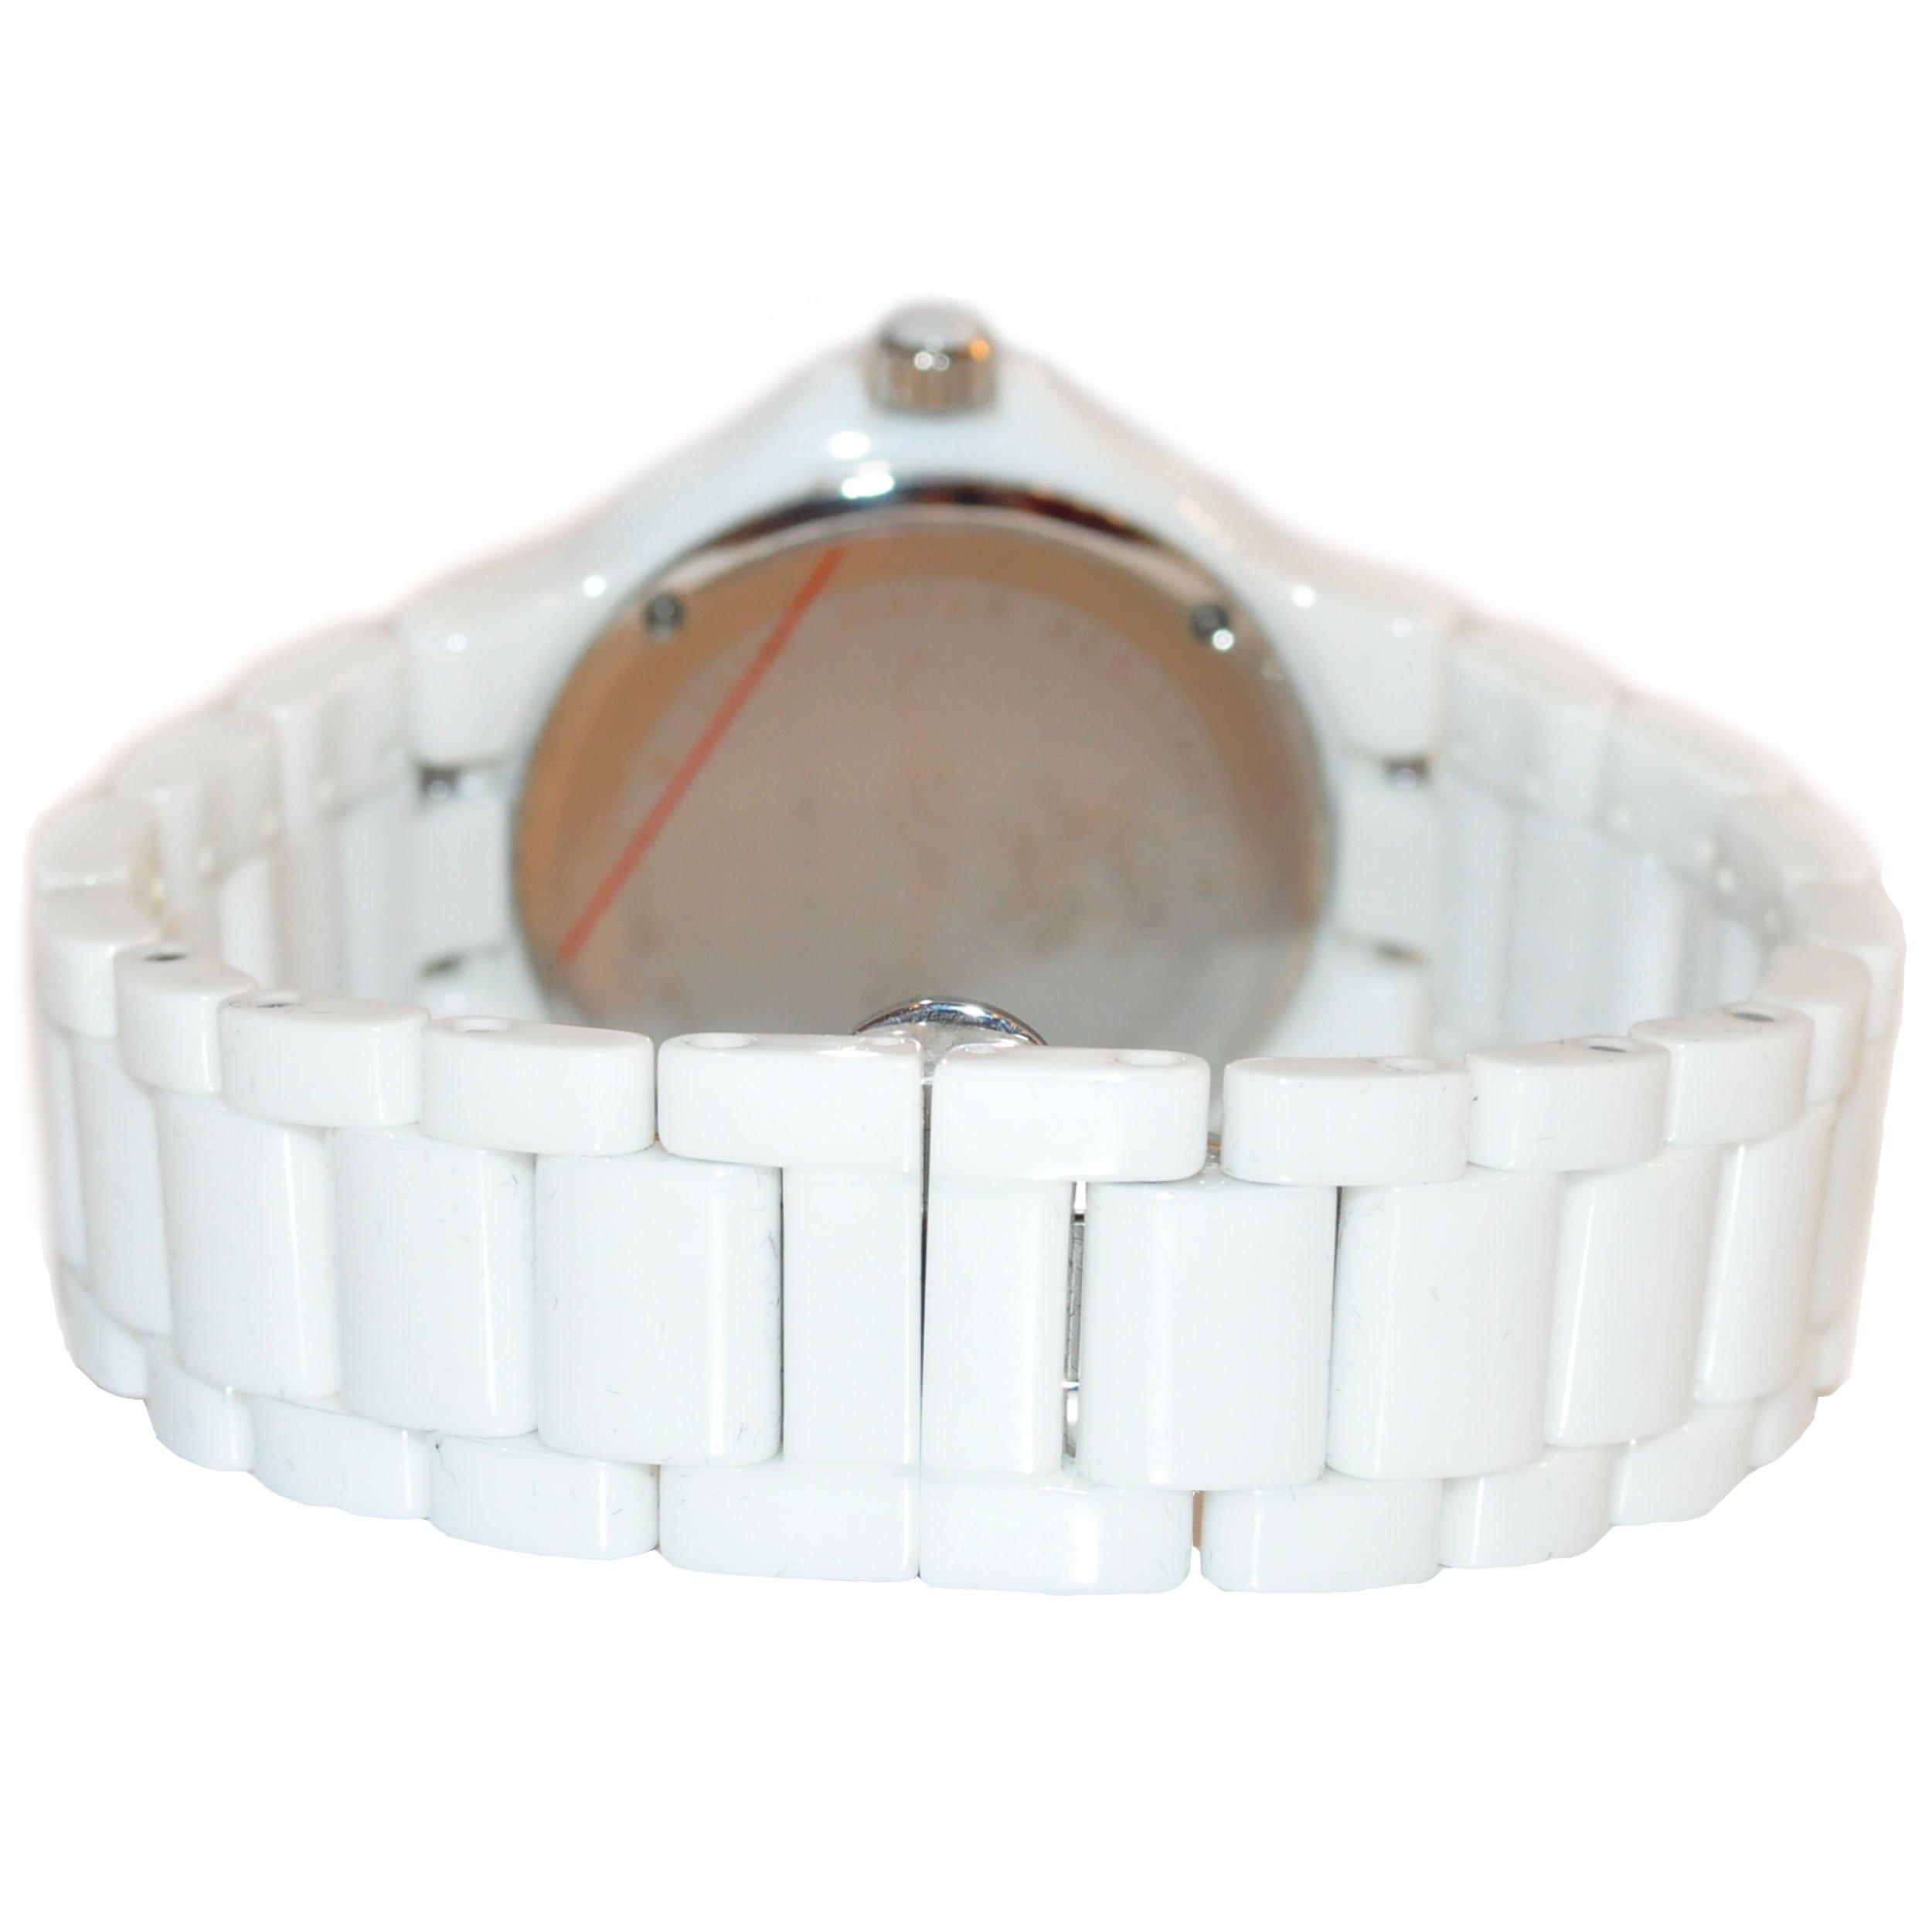 Ed Hardy Dreamer Love Kills Slowly Swarovski Crystal/ceramic Watch, Dm-lk by Ed Hardy (Image #3)